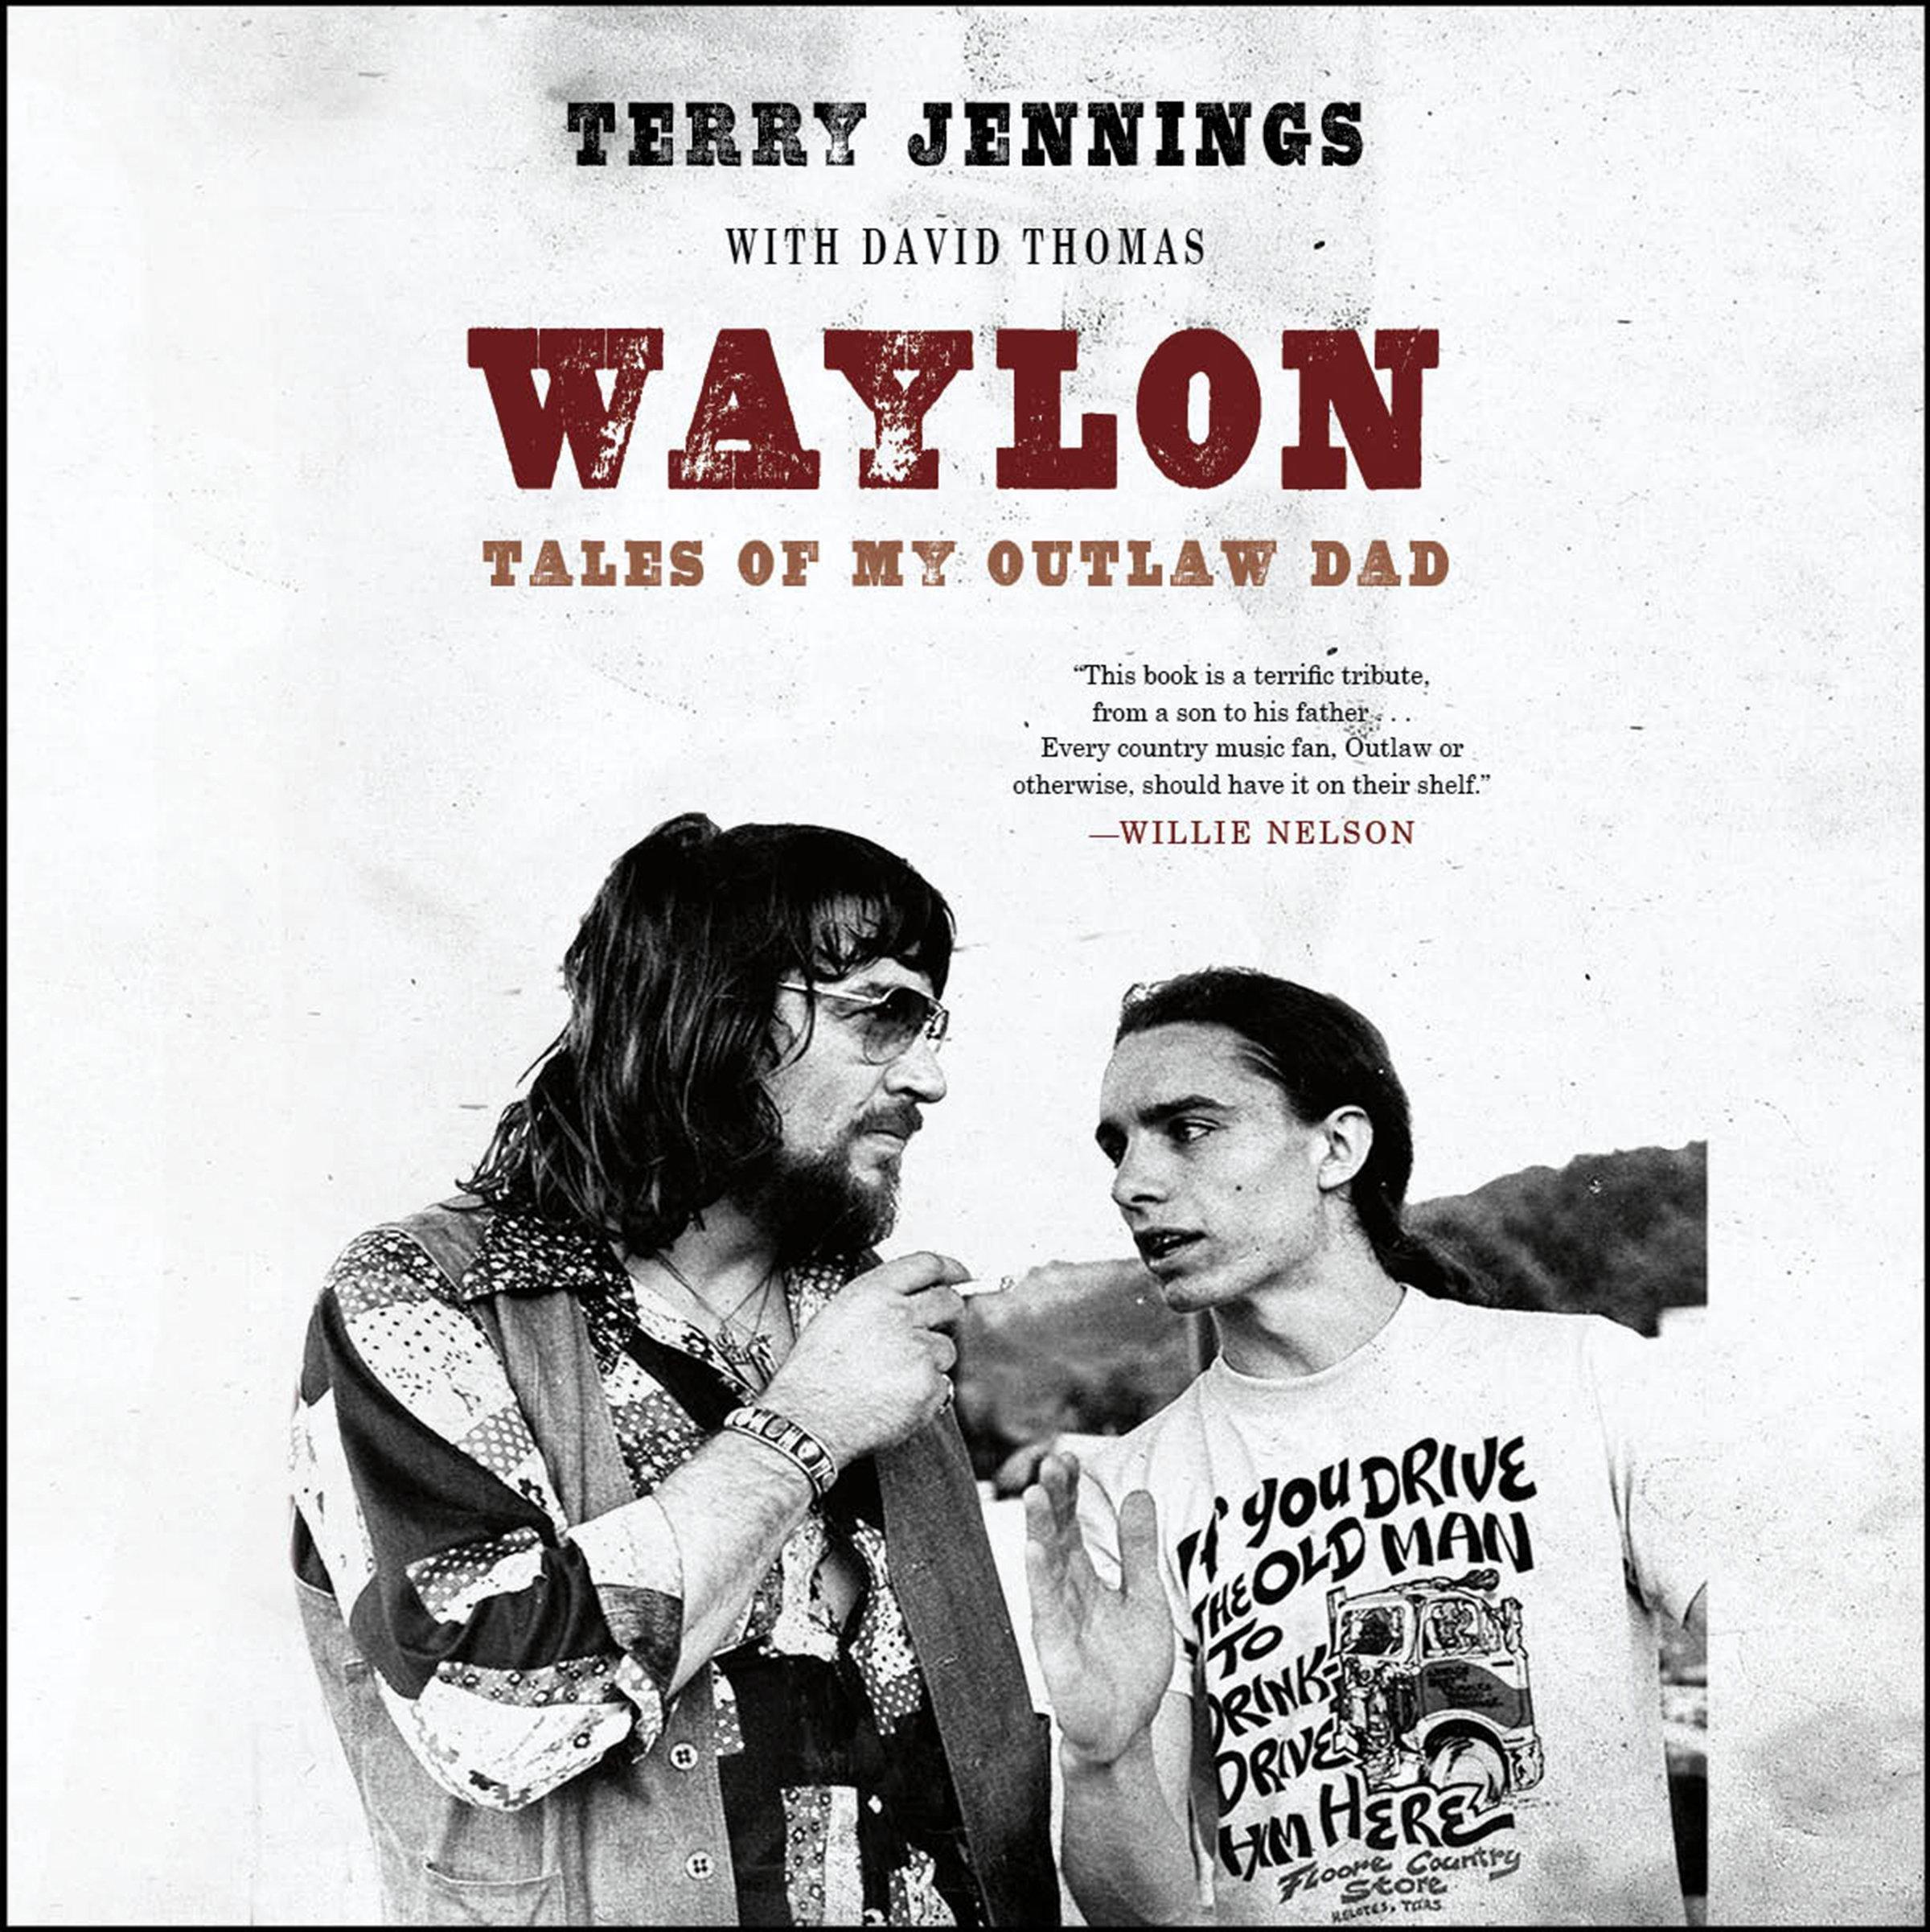 Waylon: Tales of My Outlaw Dad